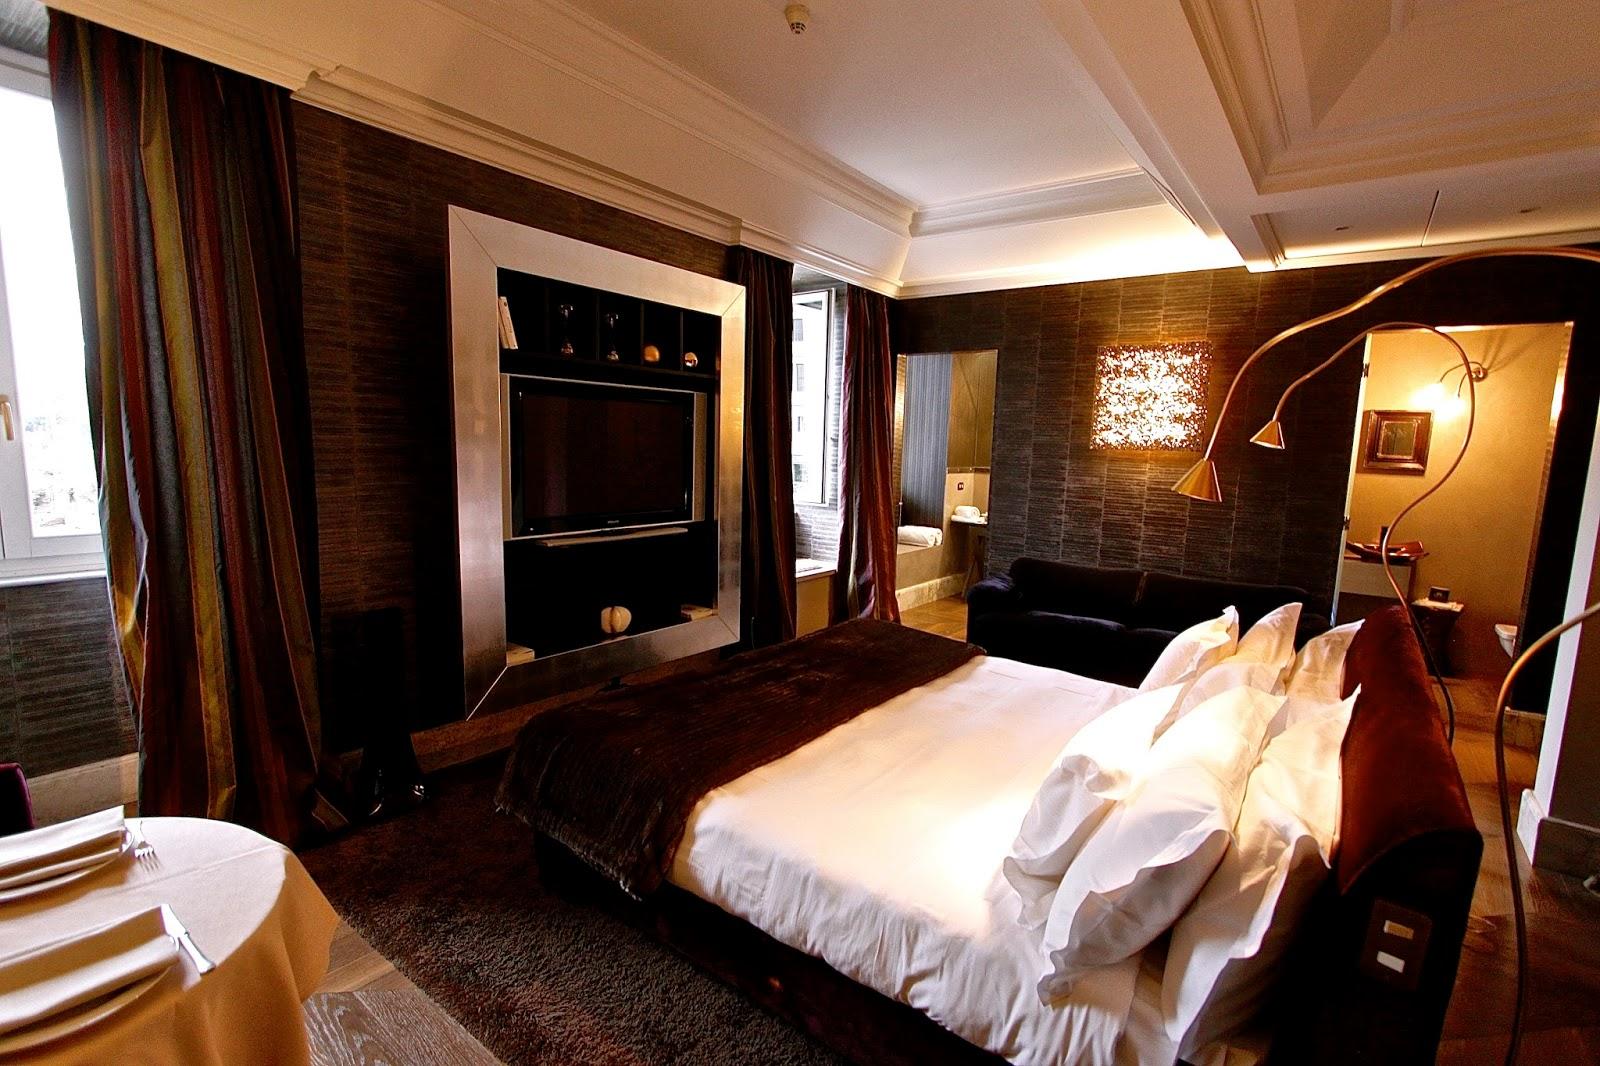 Hotel Manfredi Roma